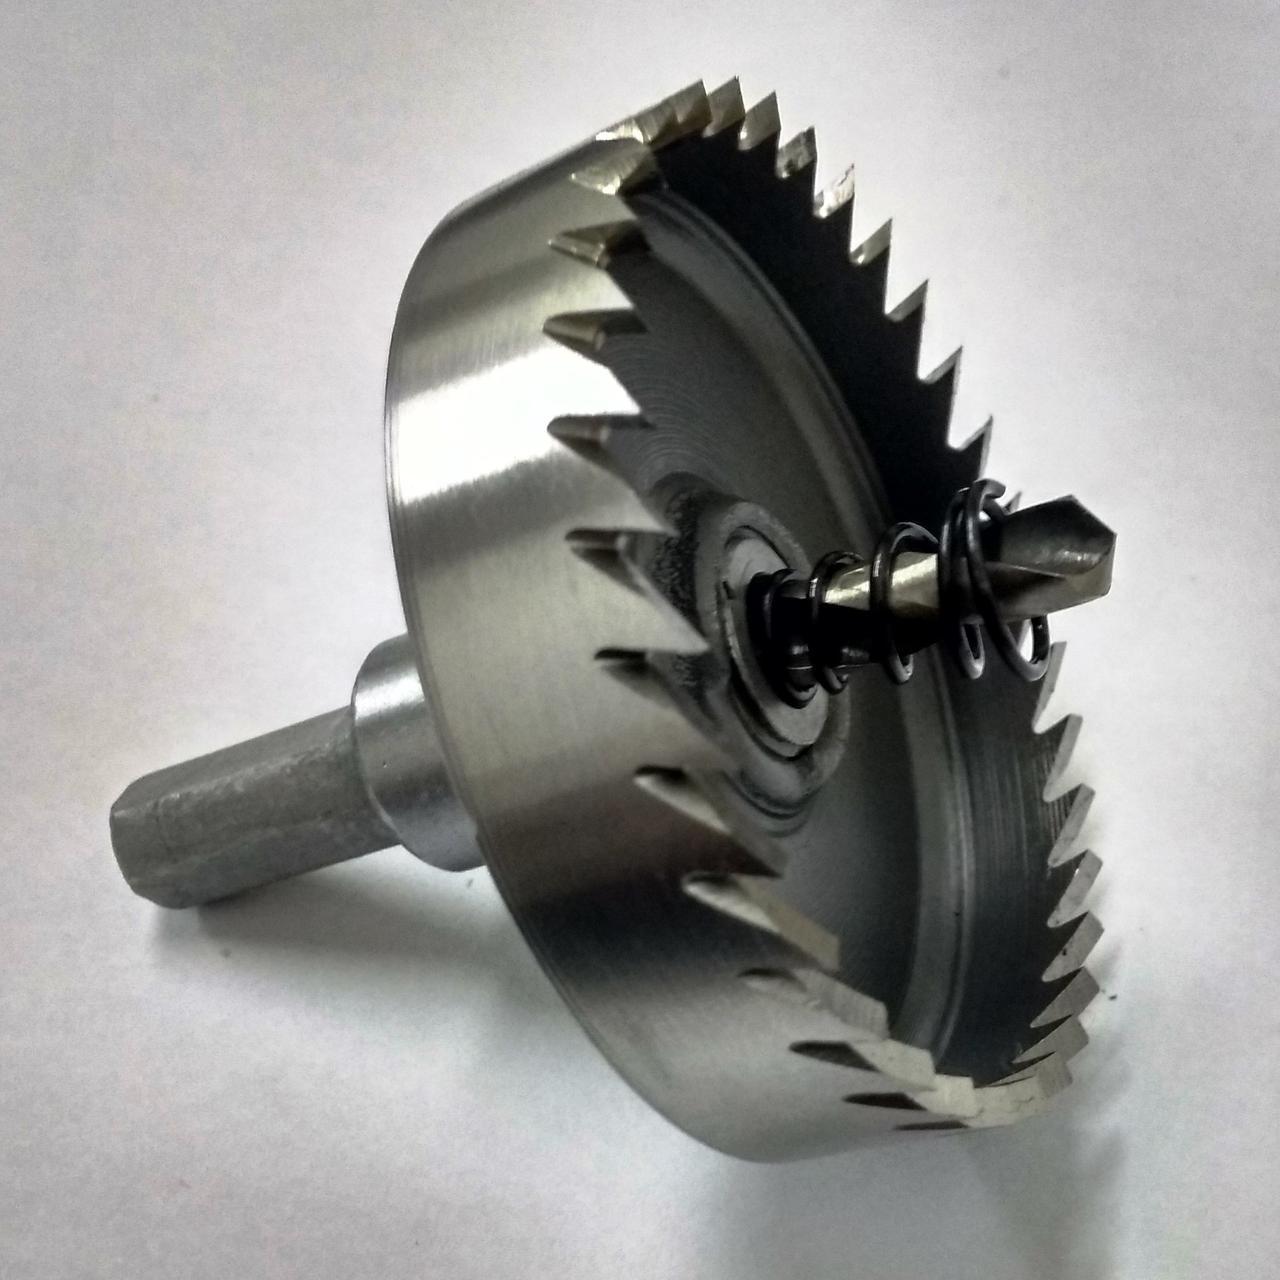 Коронка по металлу (Фреза корончатая) ф.40мм Р6М5